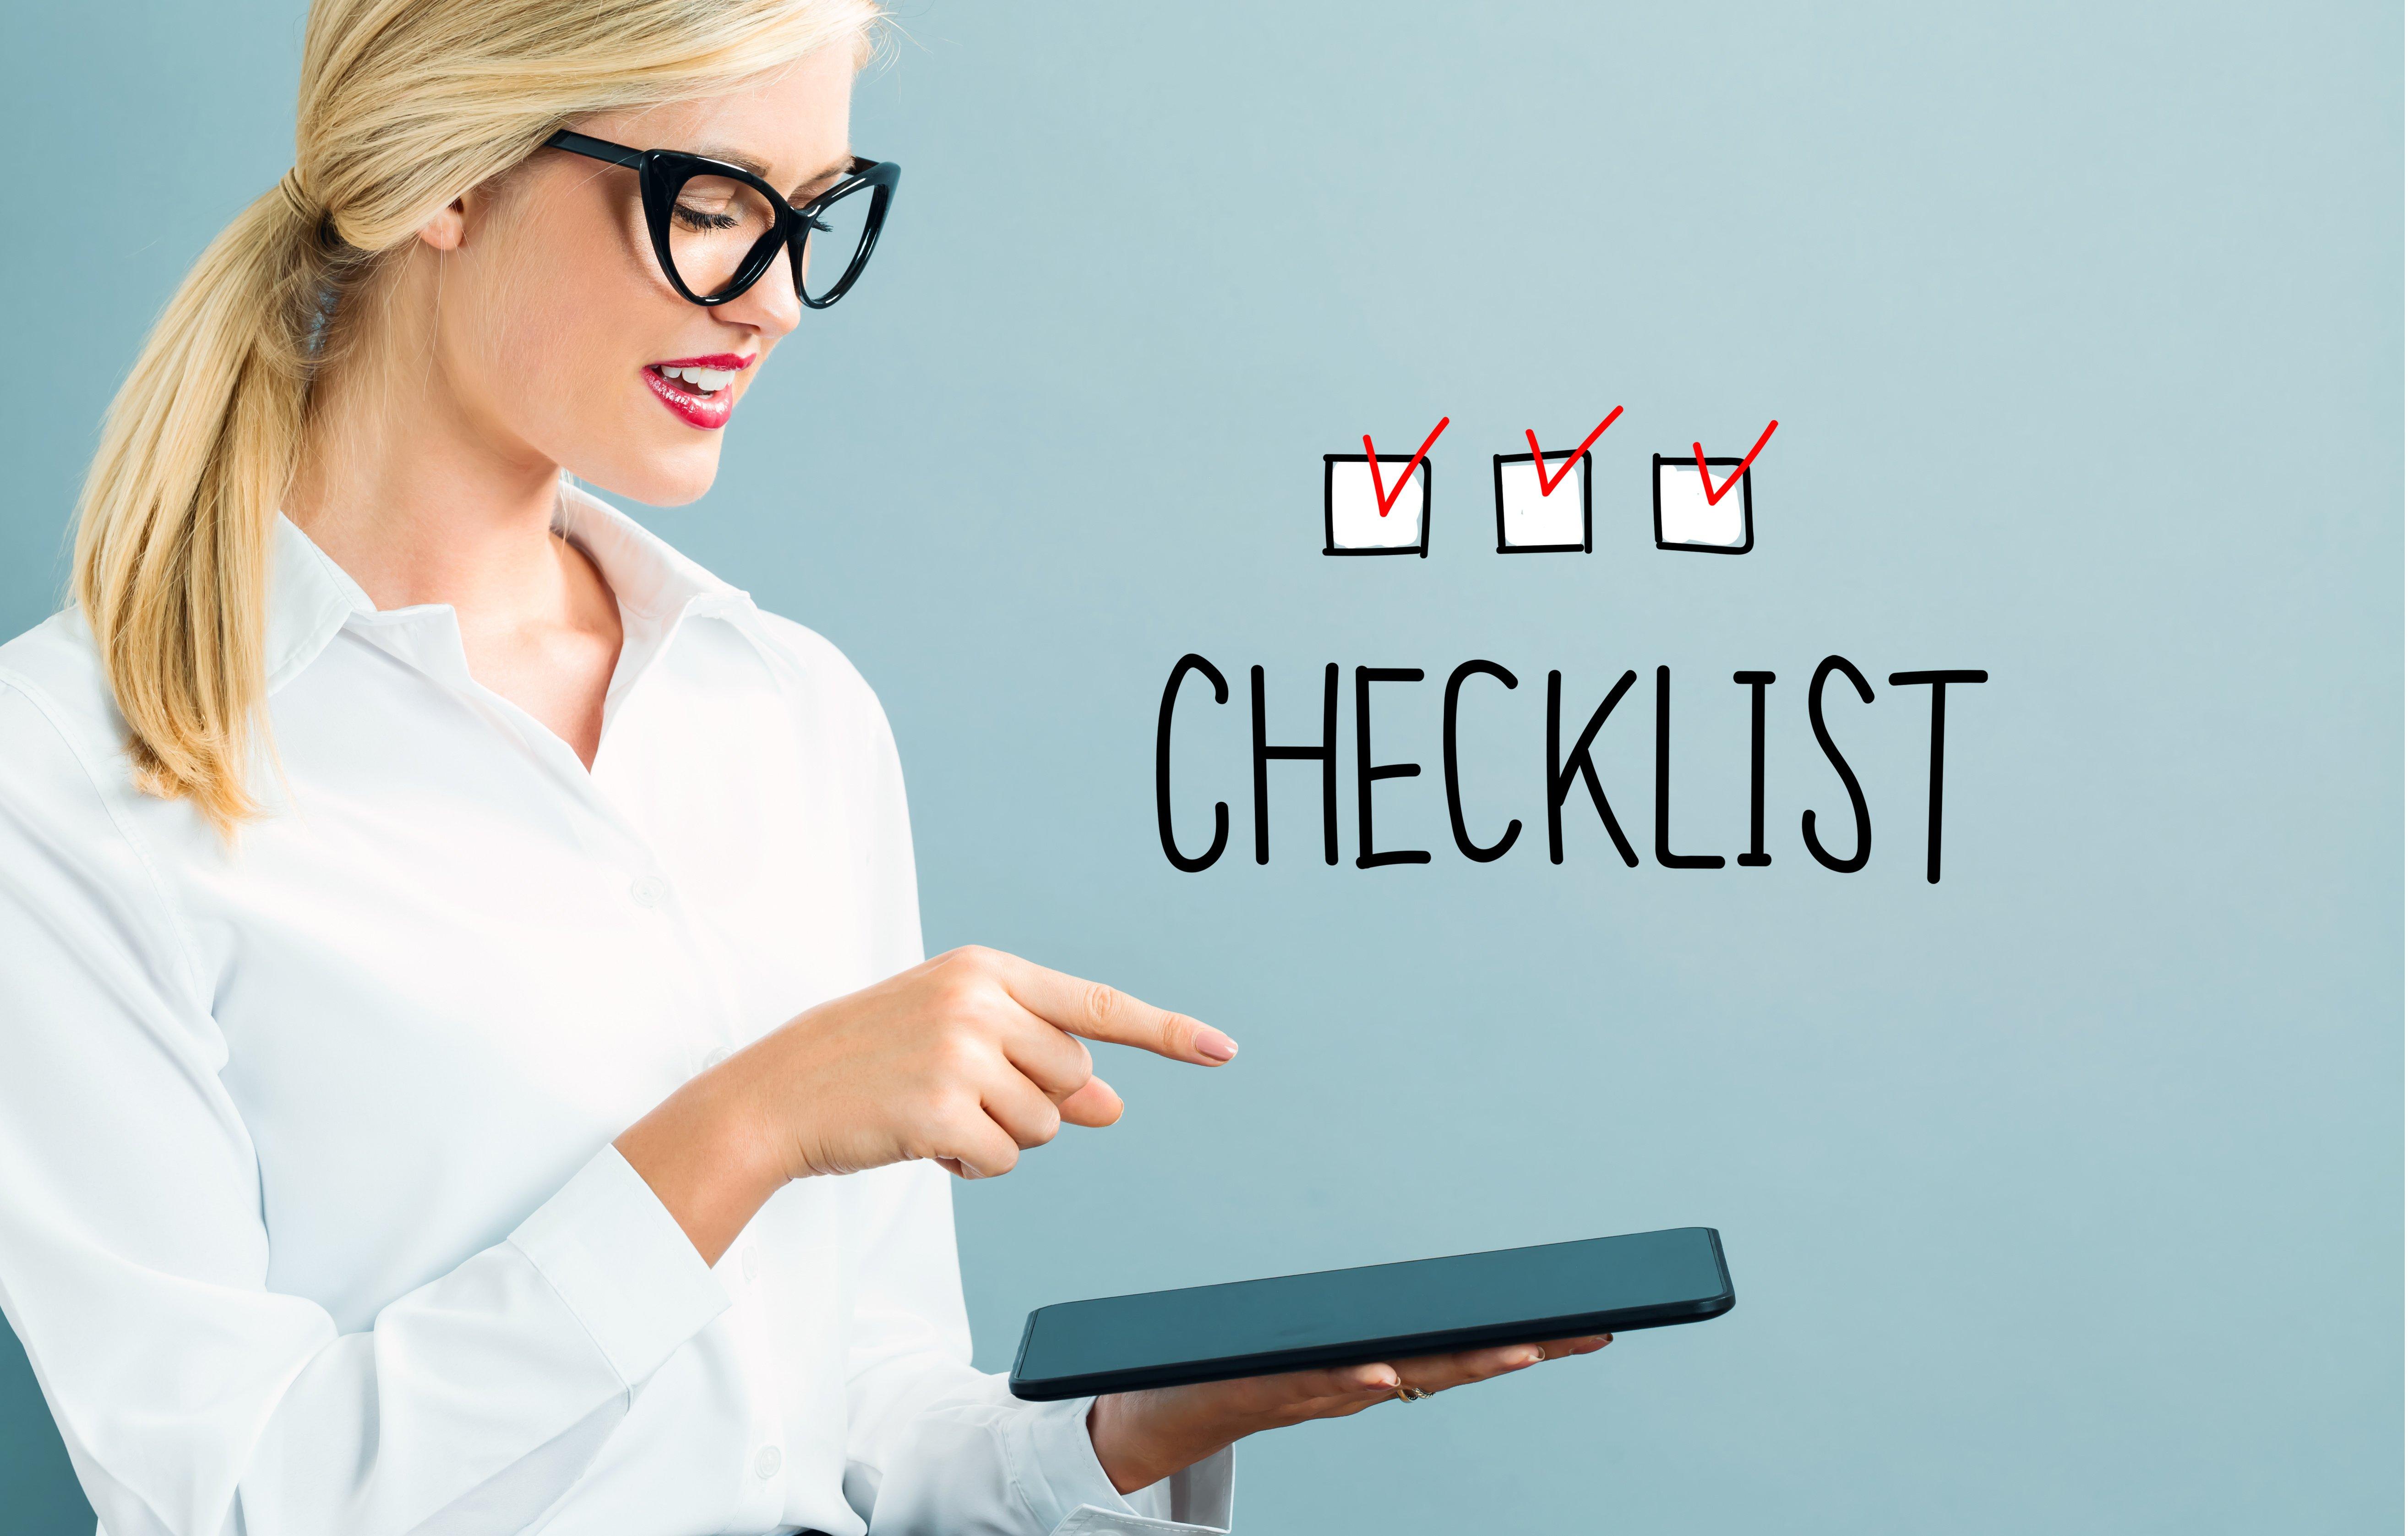 crm 2017 check list